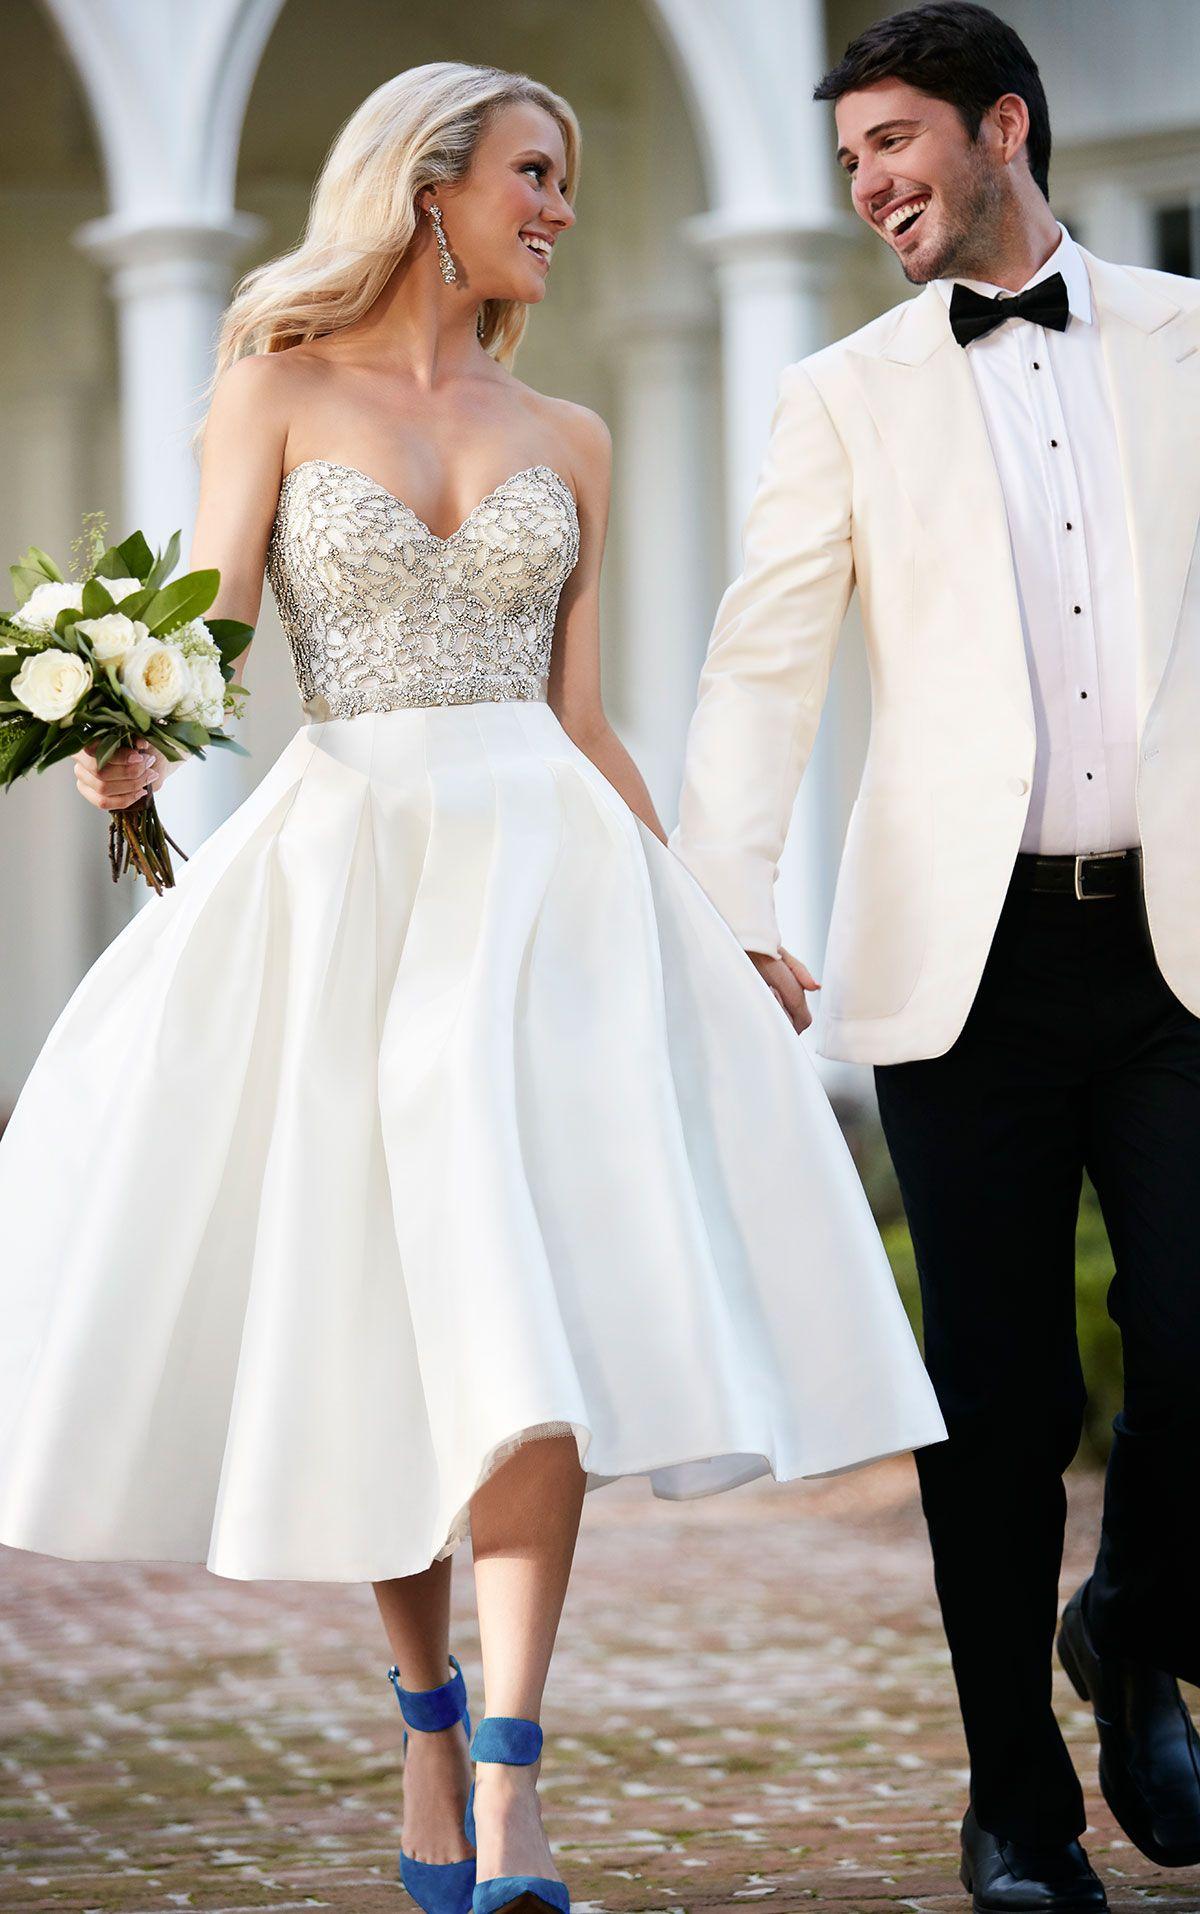 Vintage Wedding Dress Separates Martina Liana Wedding Dresses Wedding Dress Seperates Tea Length Wedding Dress Wedding Dress Separates [ 1914 x 1200 Pixel ]